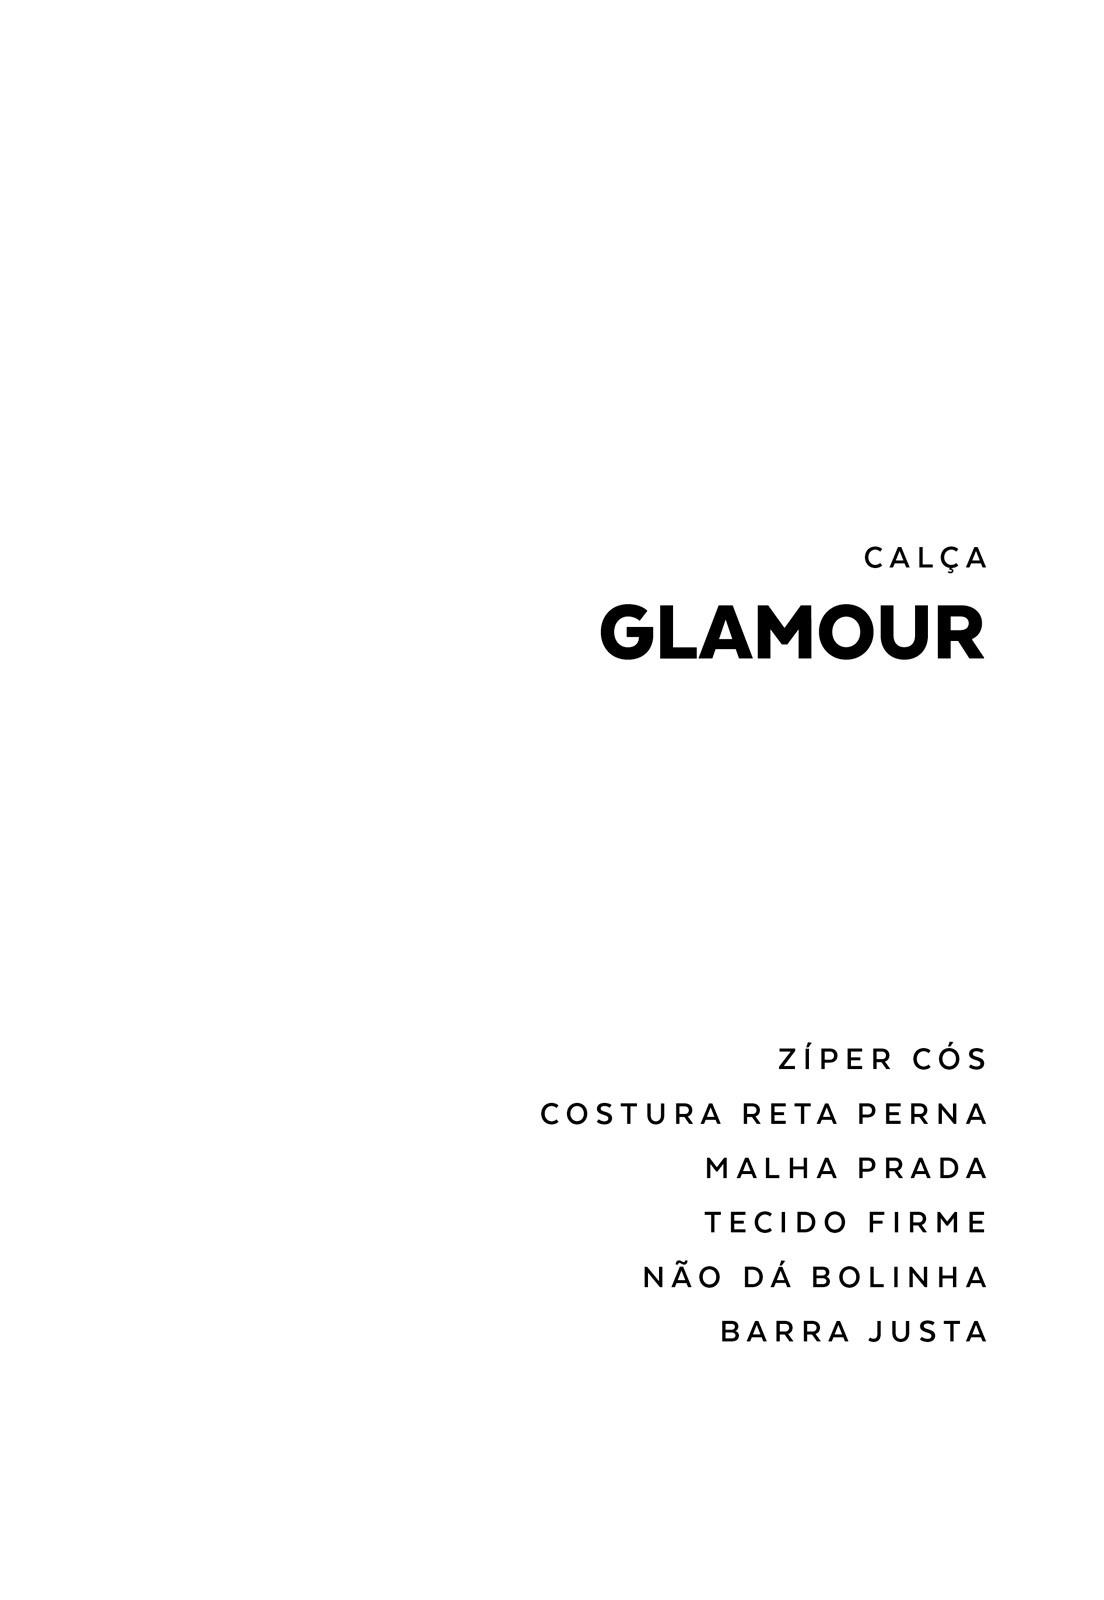 Calça Glamour